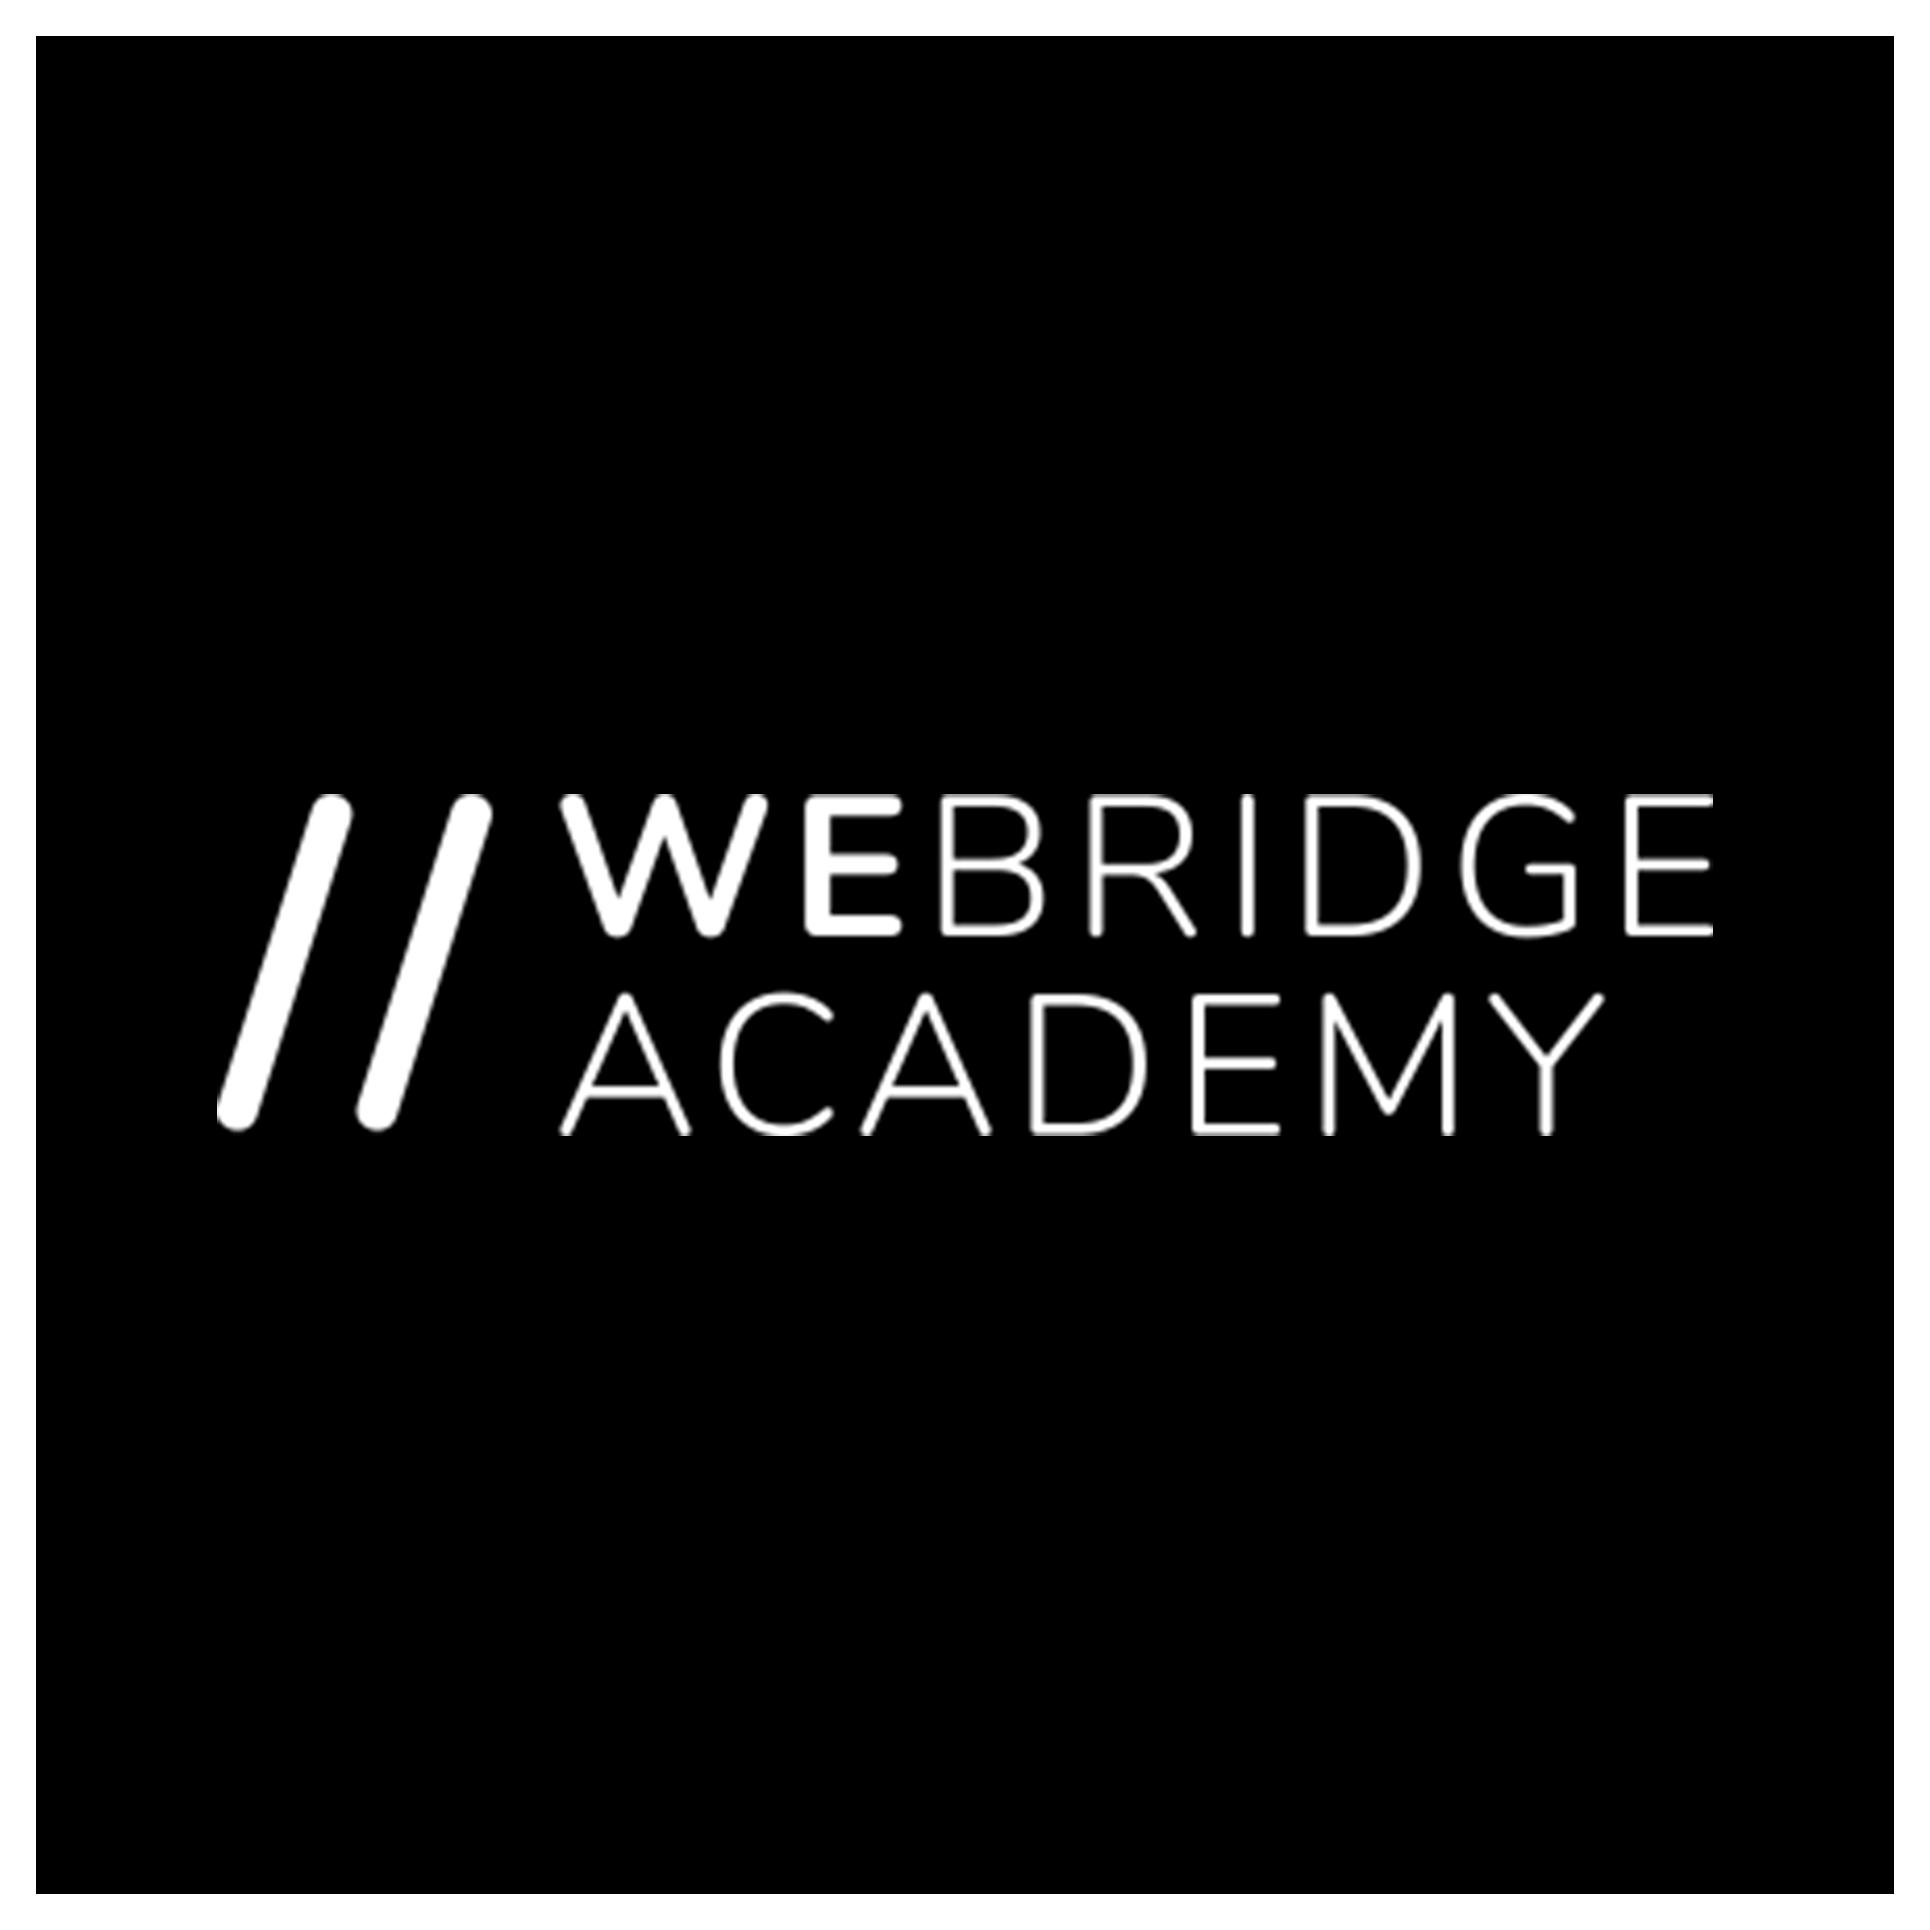 WEBridge Academy Logo